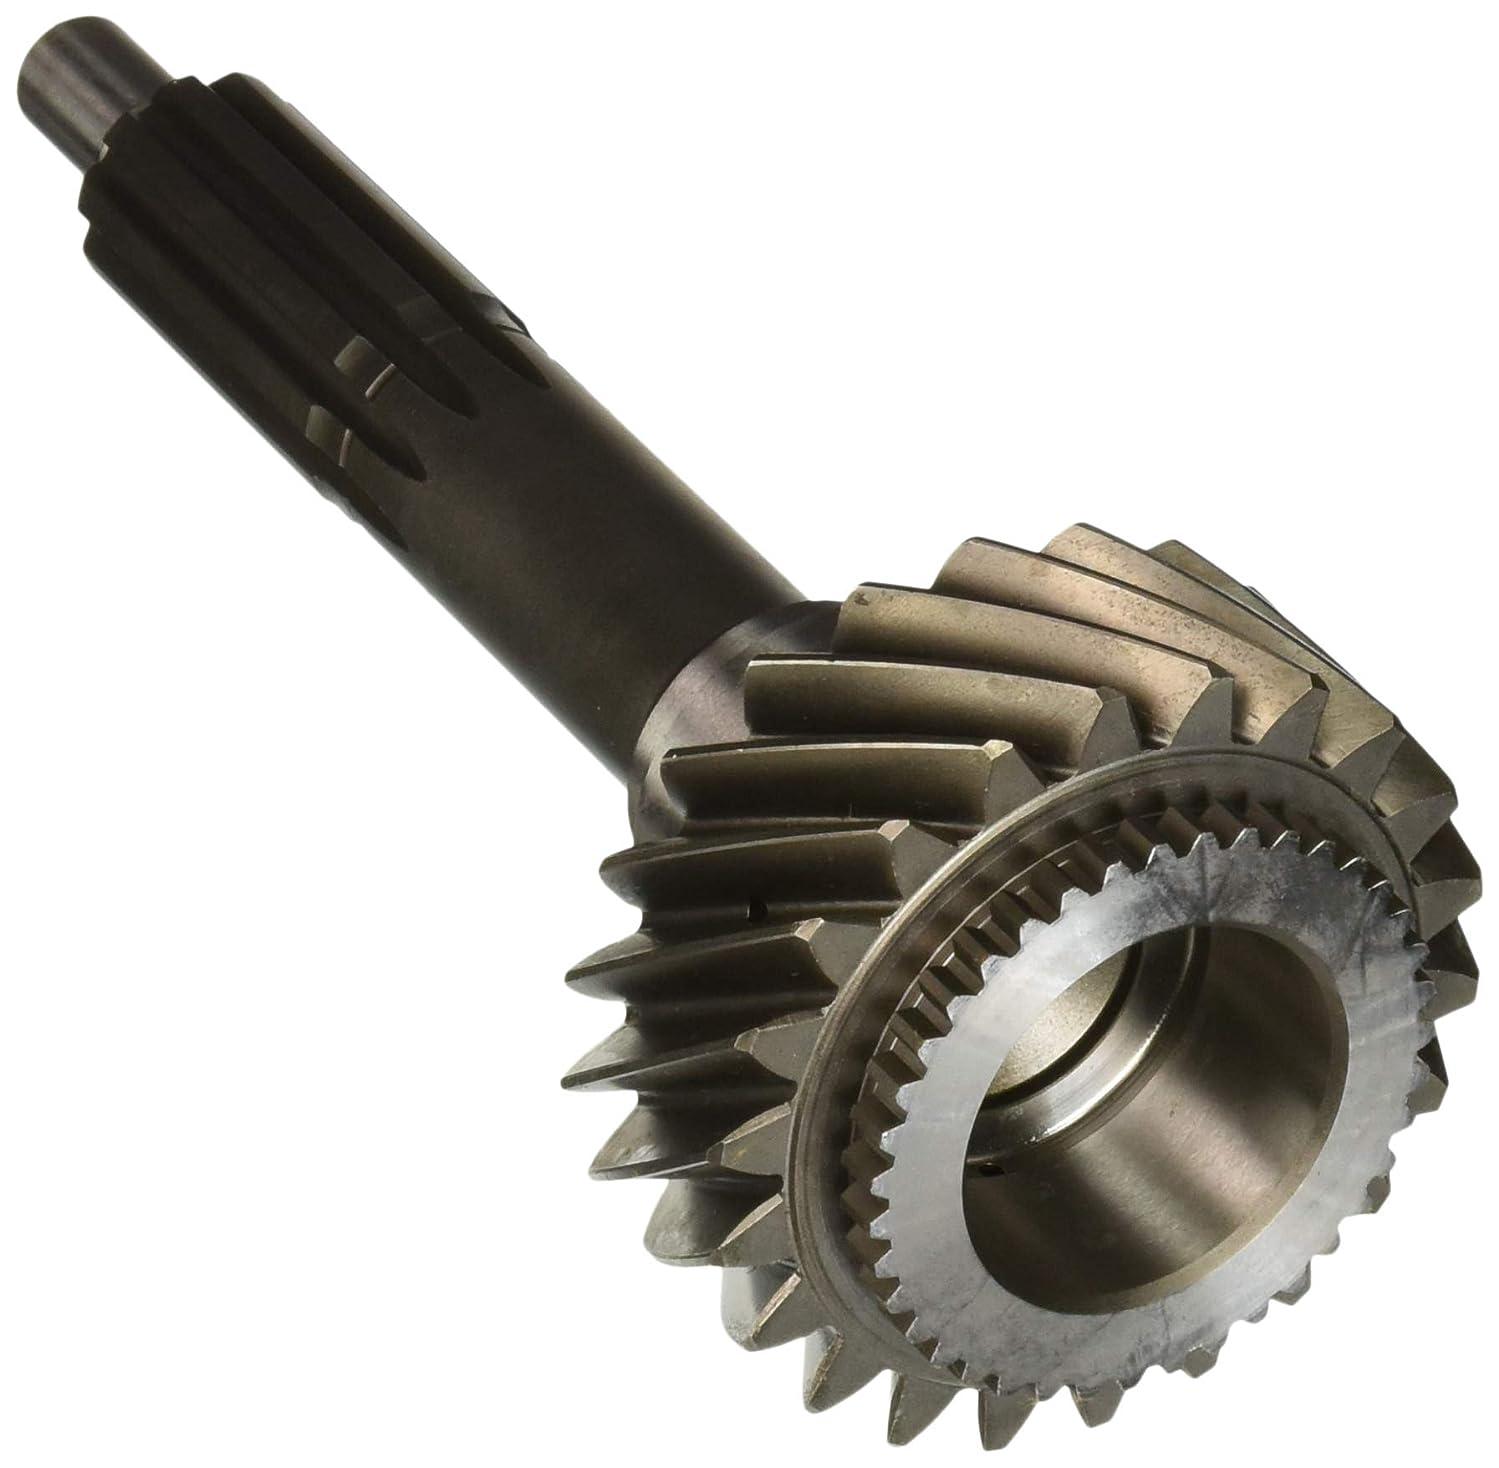 Motive Gear NV20018R Nv4500 Input Shaft (22T) Chevy